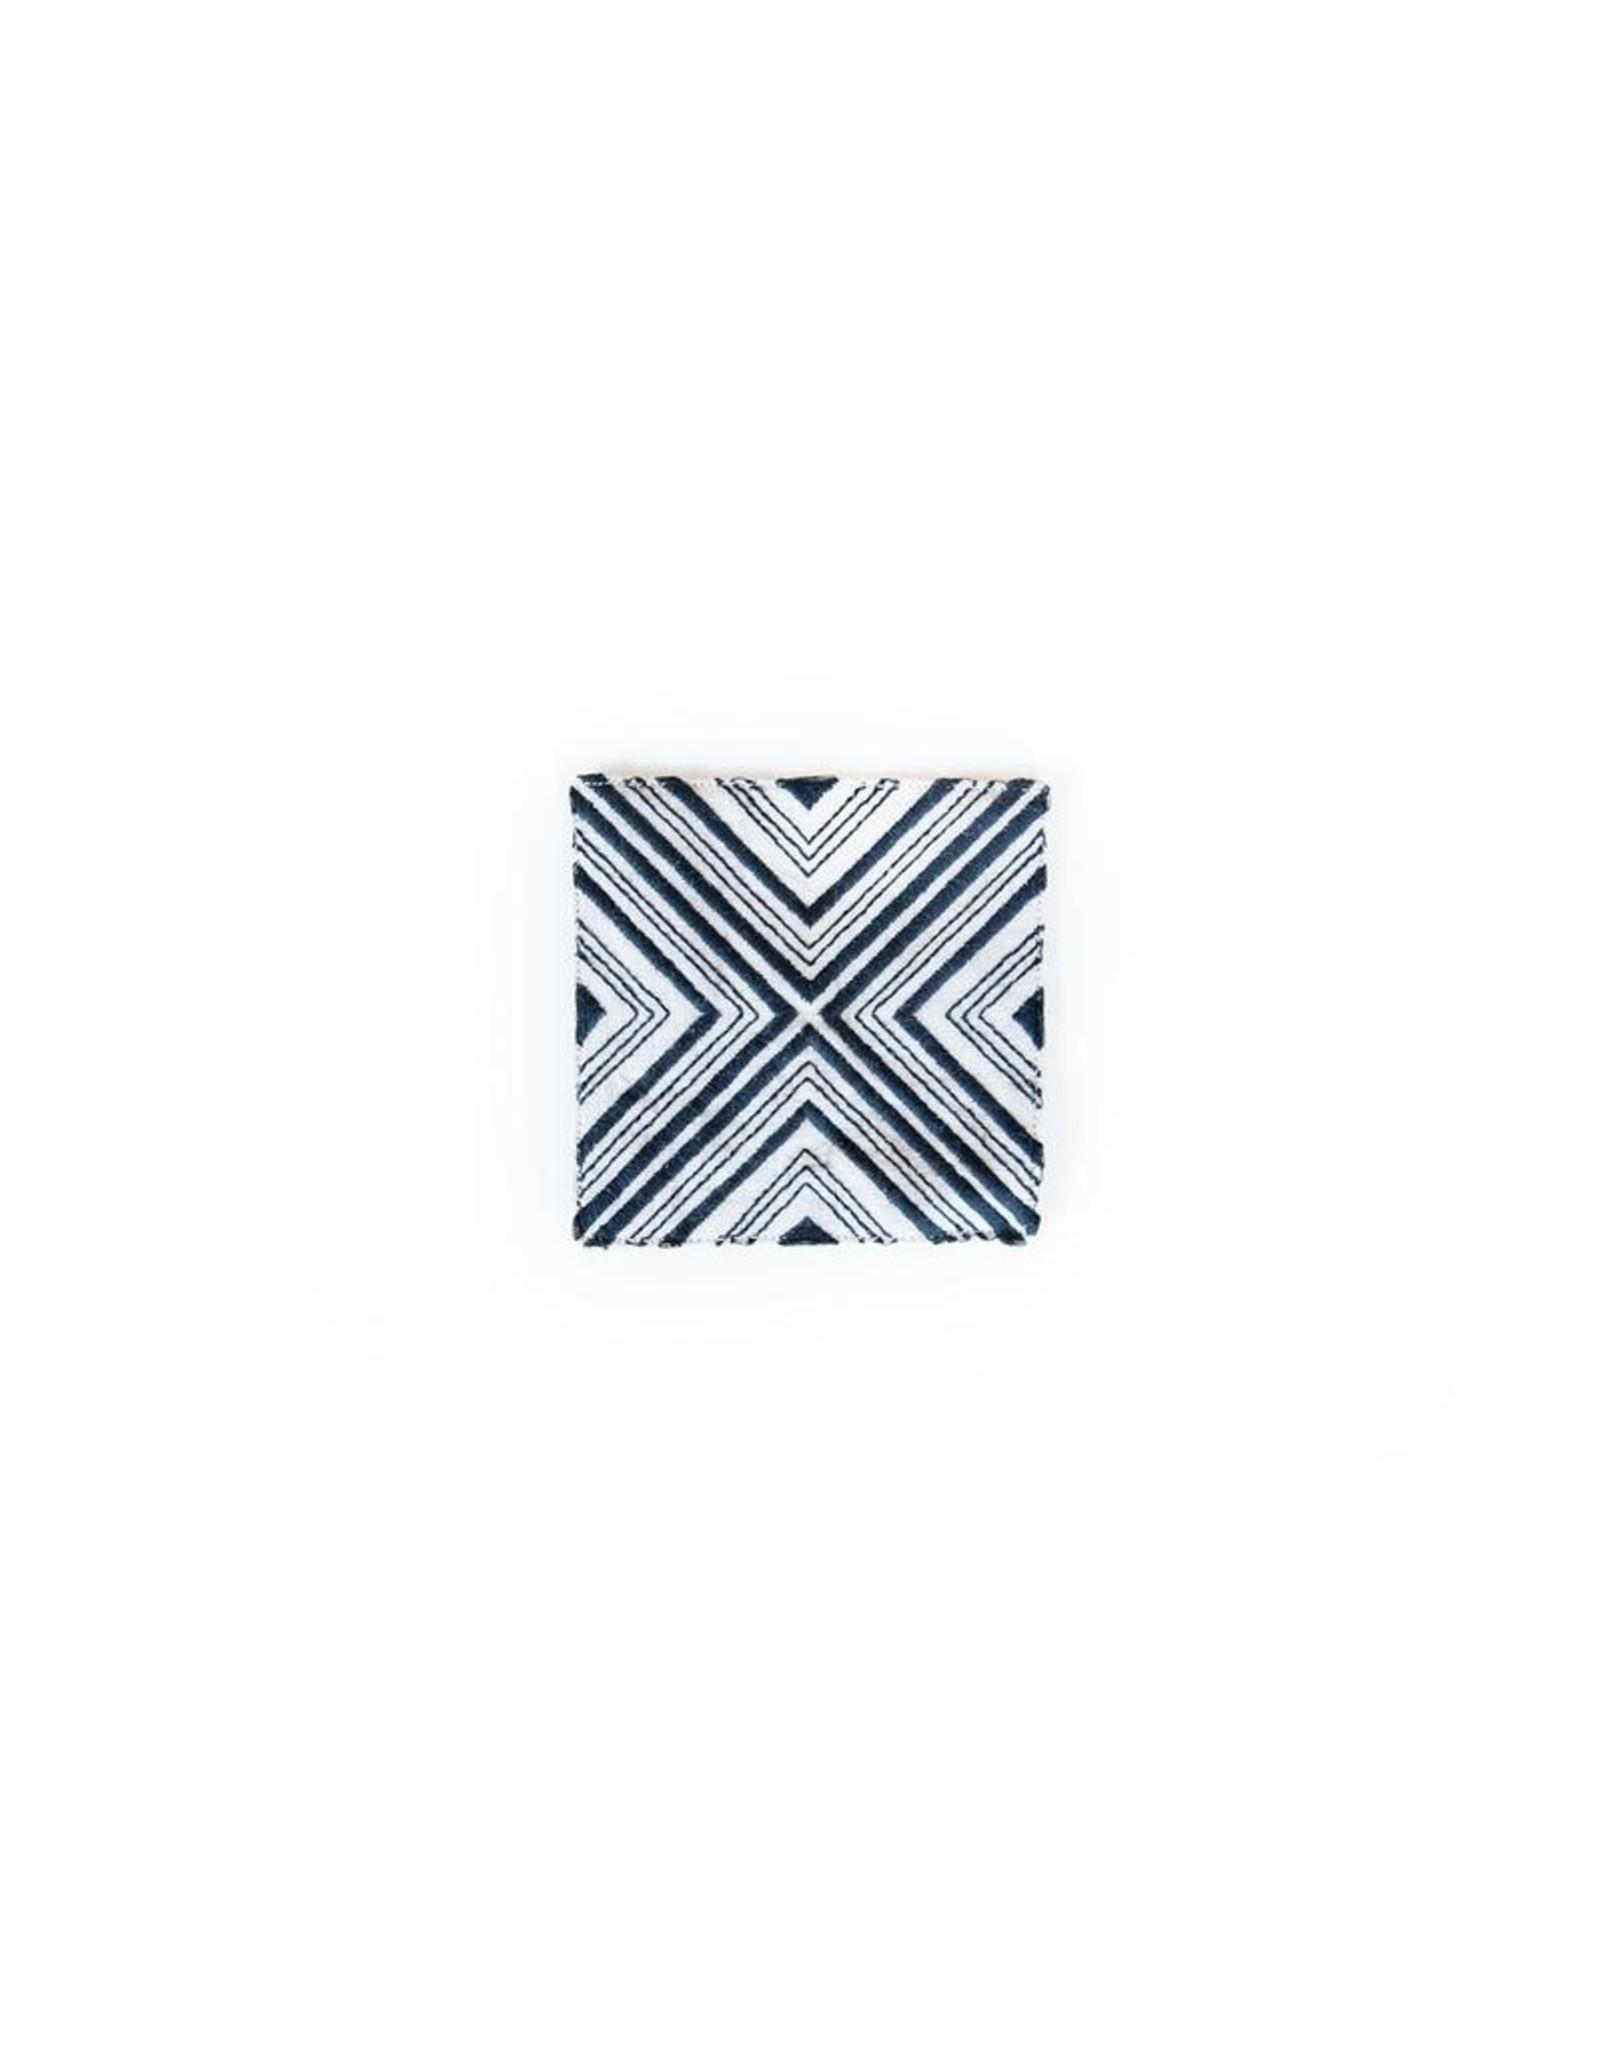 Bloom & Give Crossroads Coasters - Set of 6